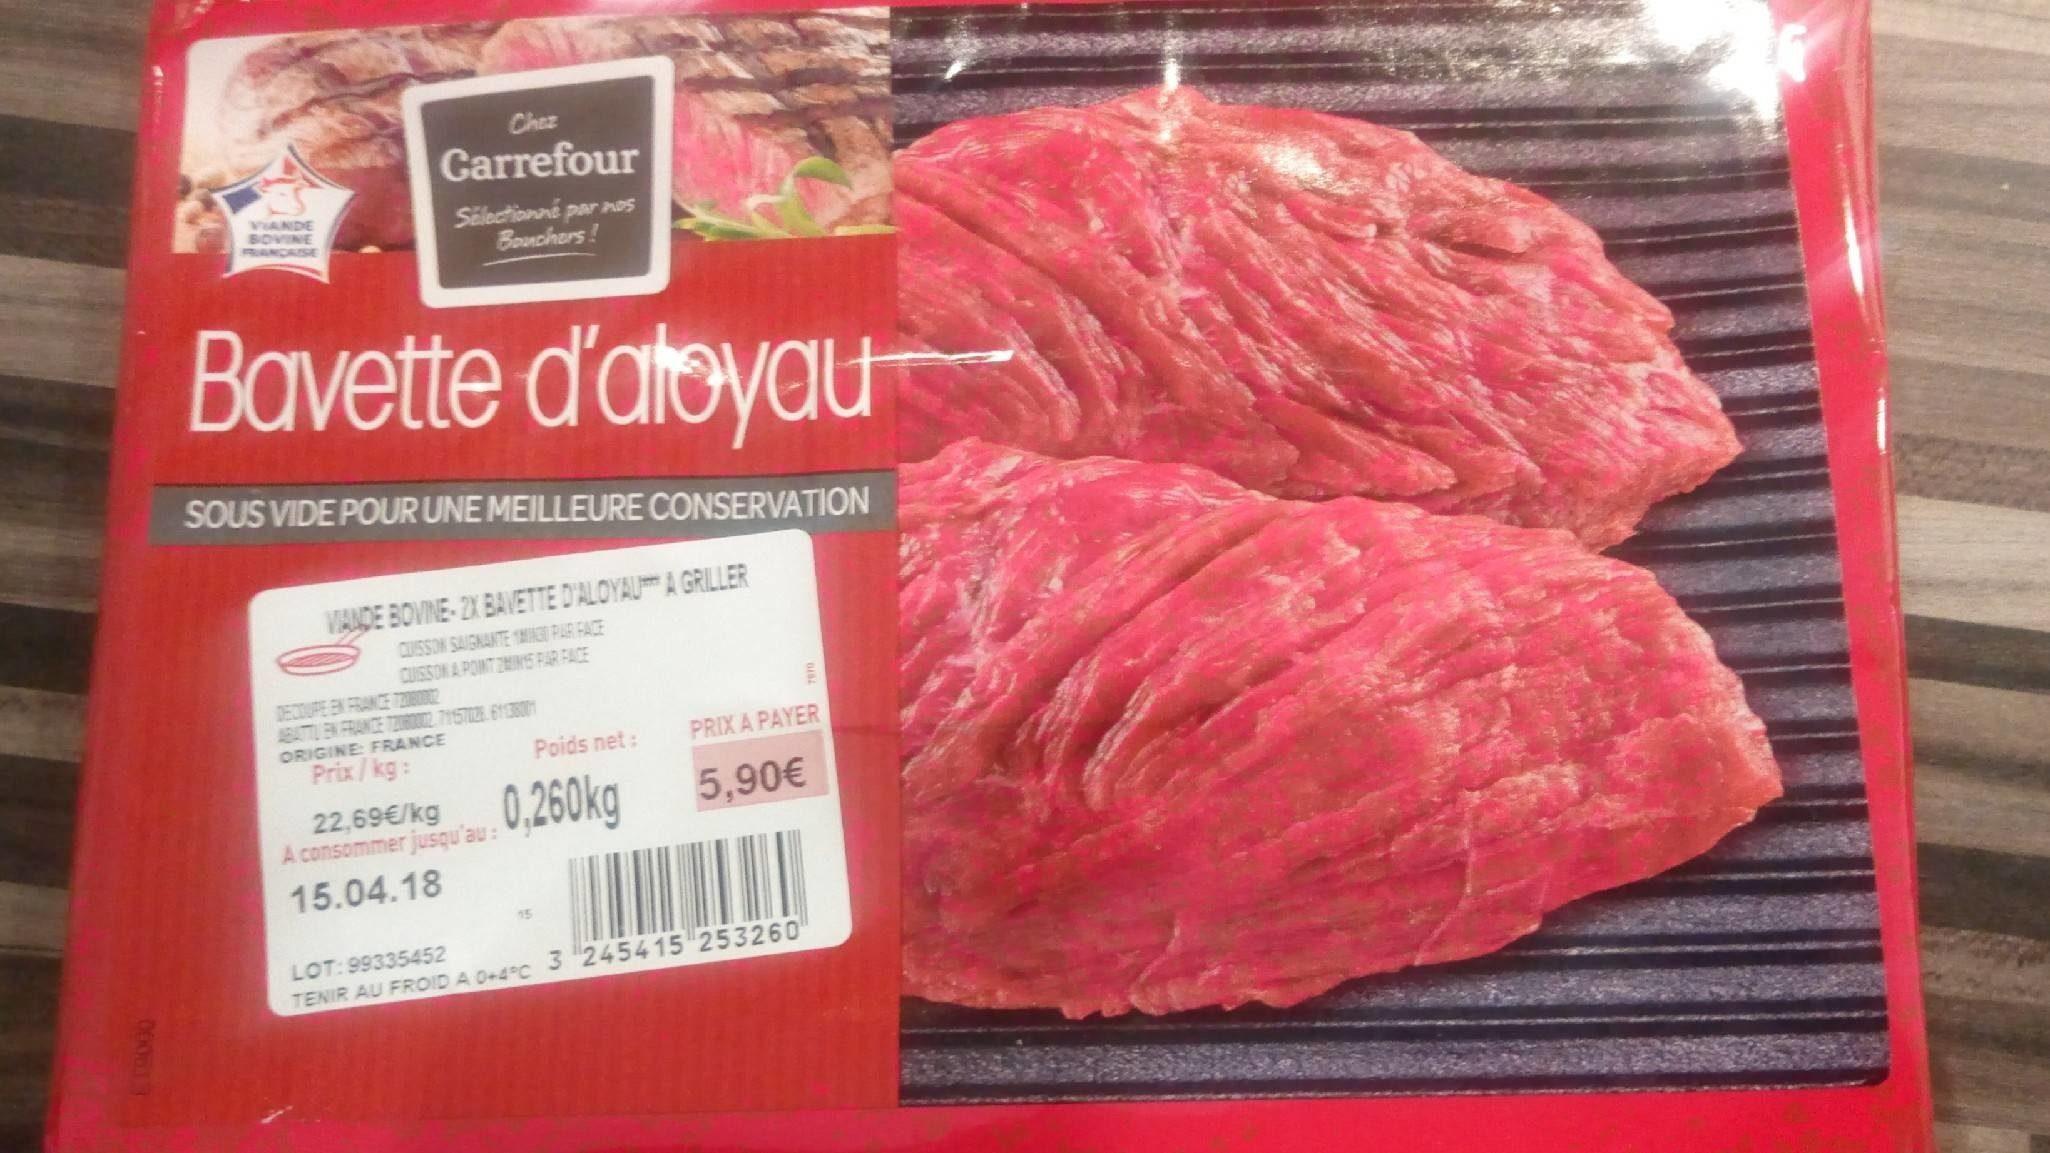 Bavette d'aloyau - Product - fr